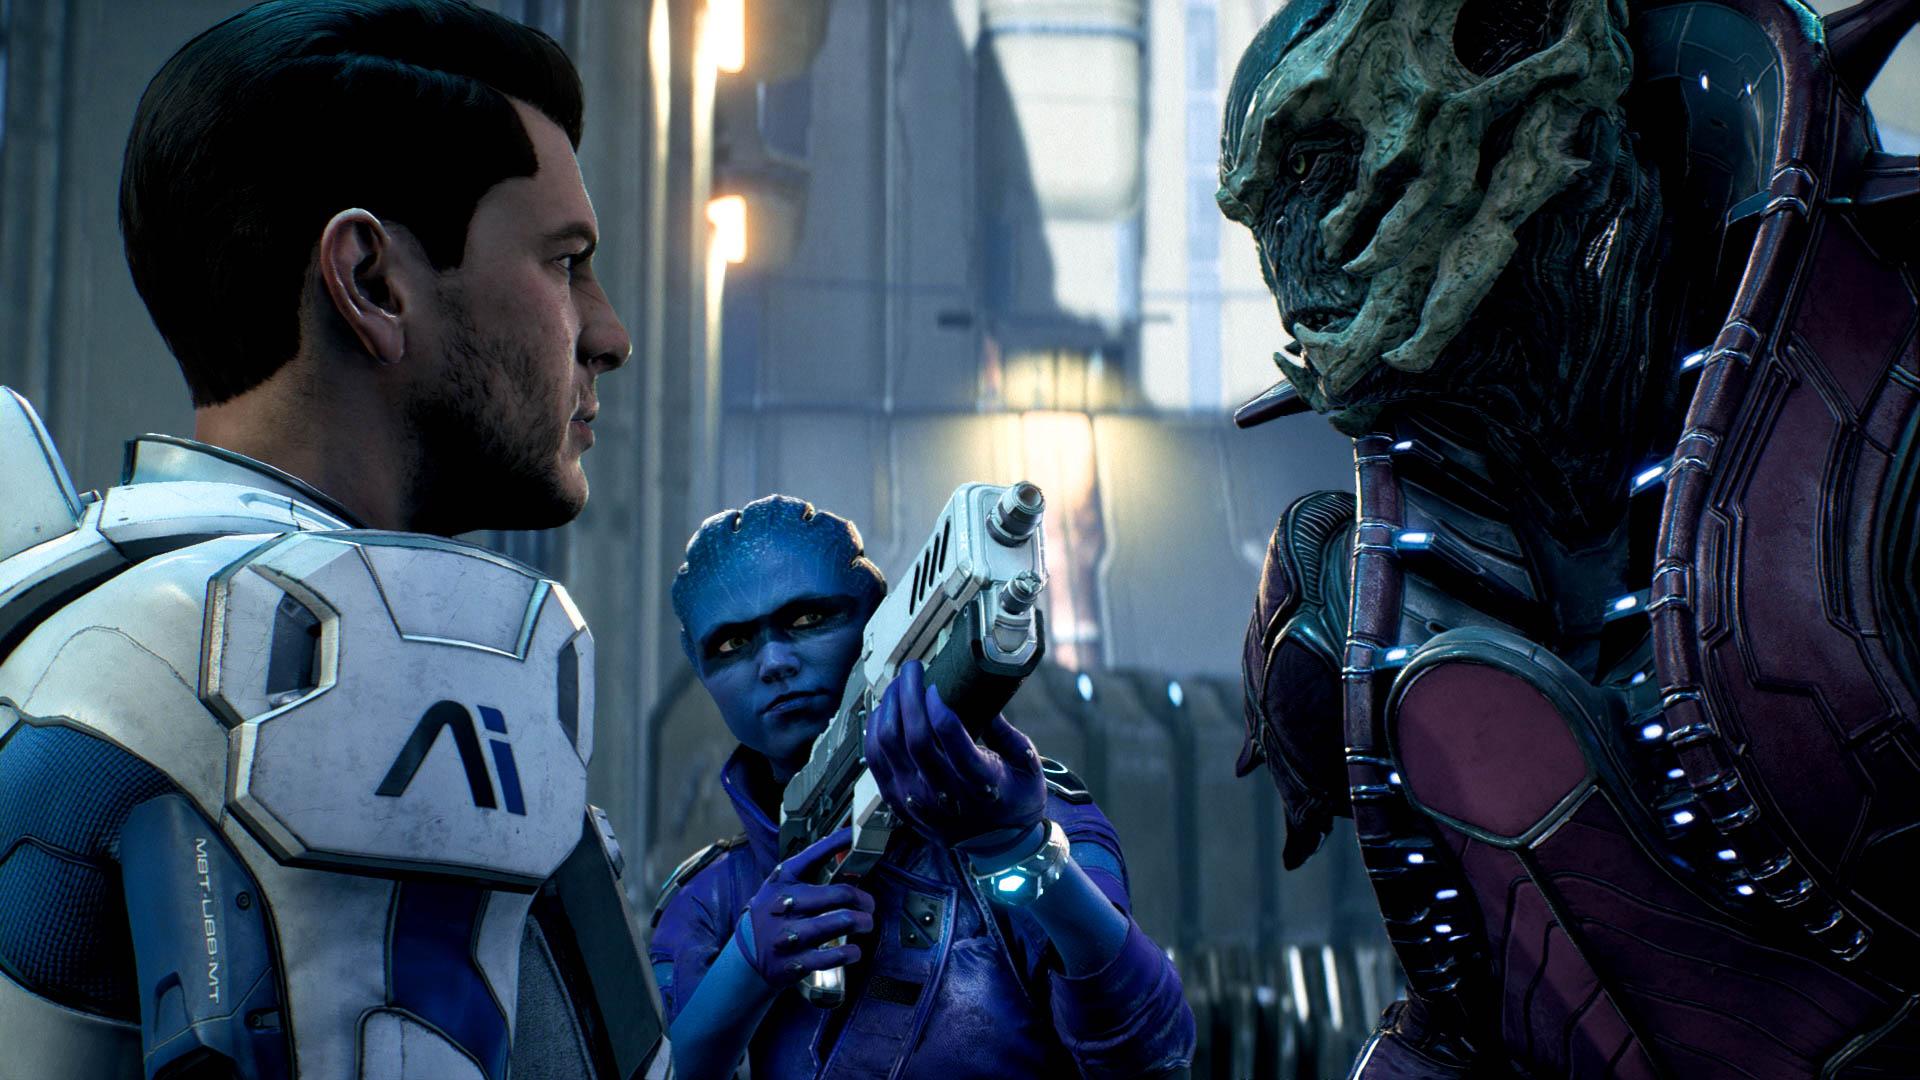 Mass Effect Andromeda: disponibile la patch 1.06